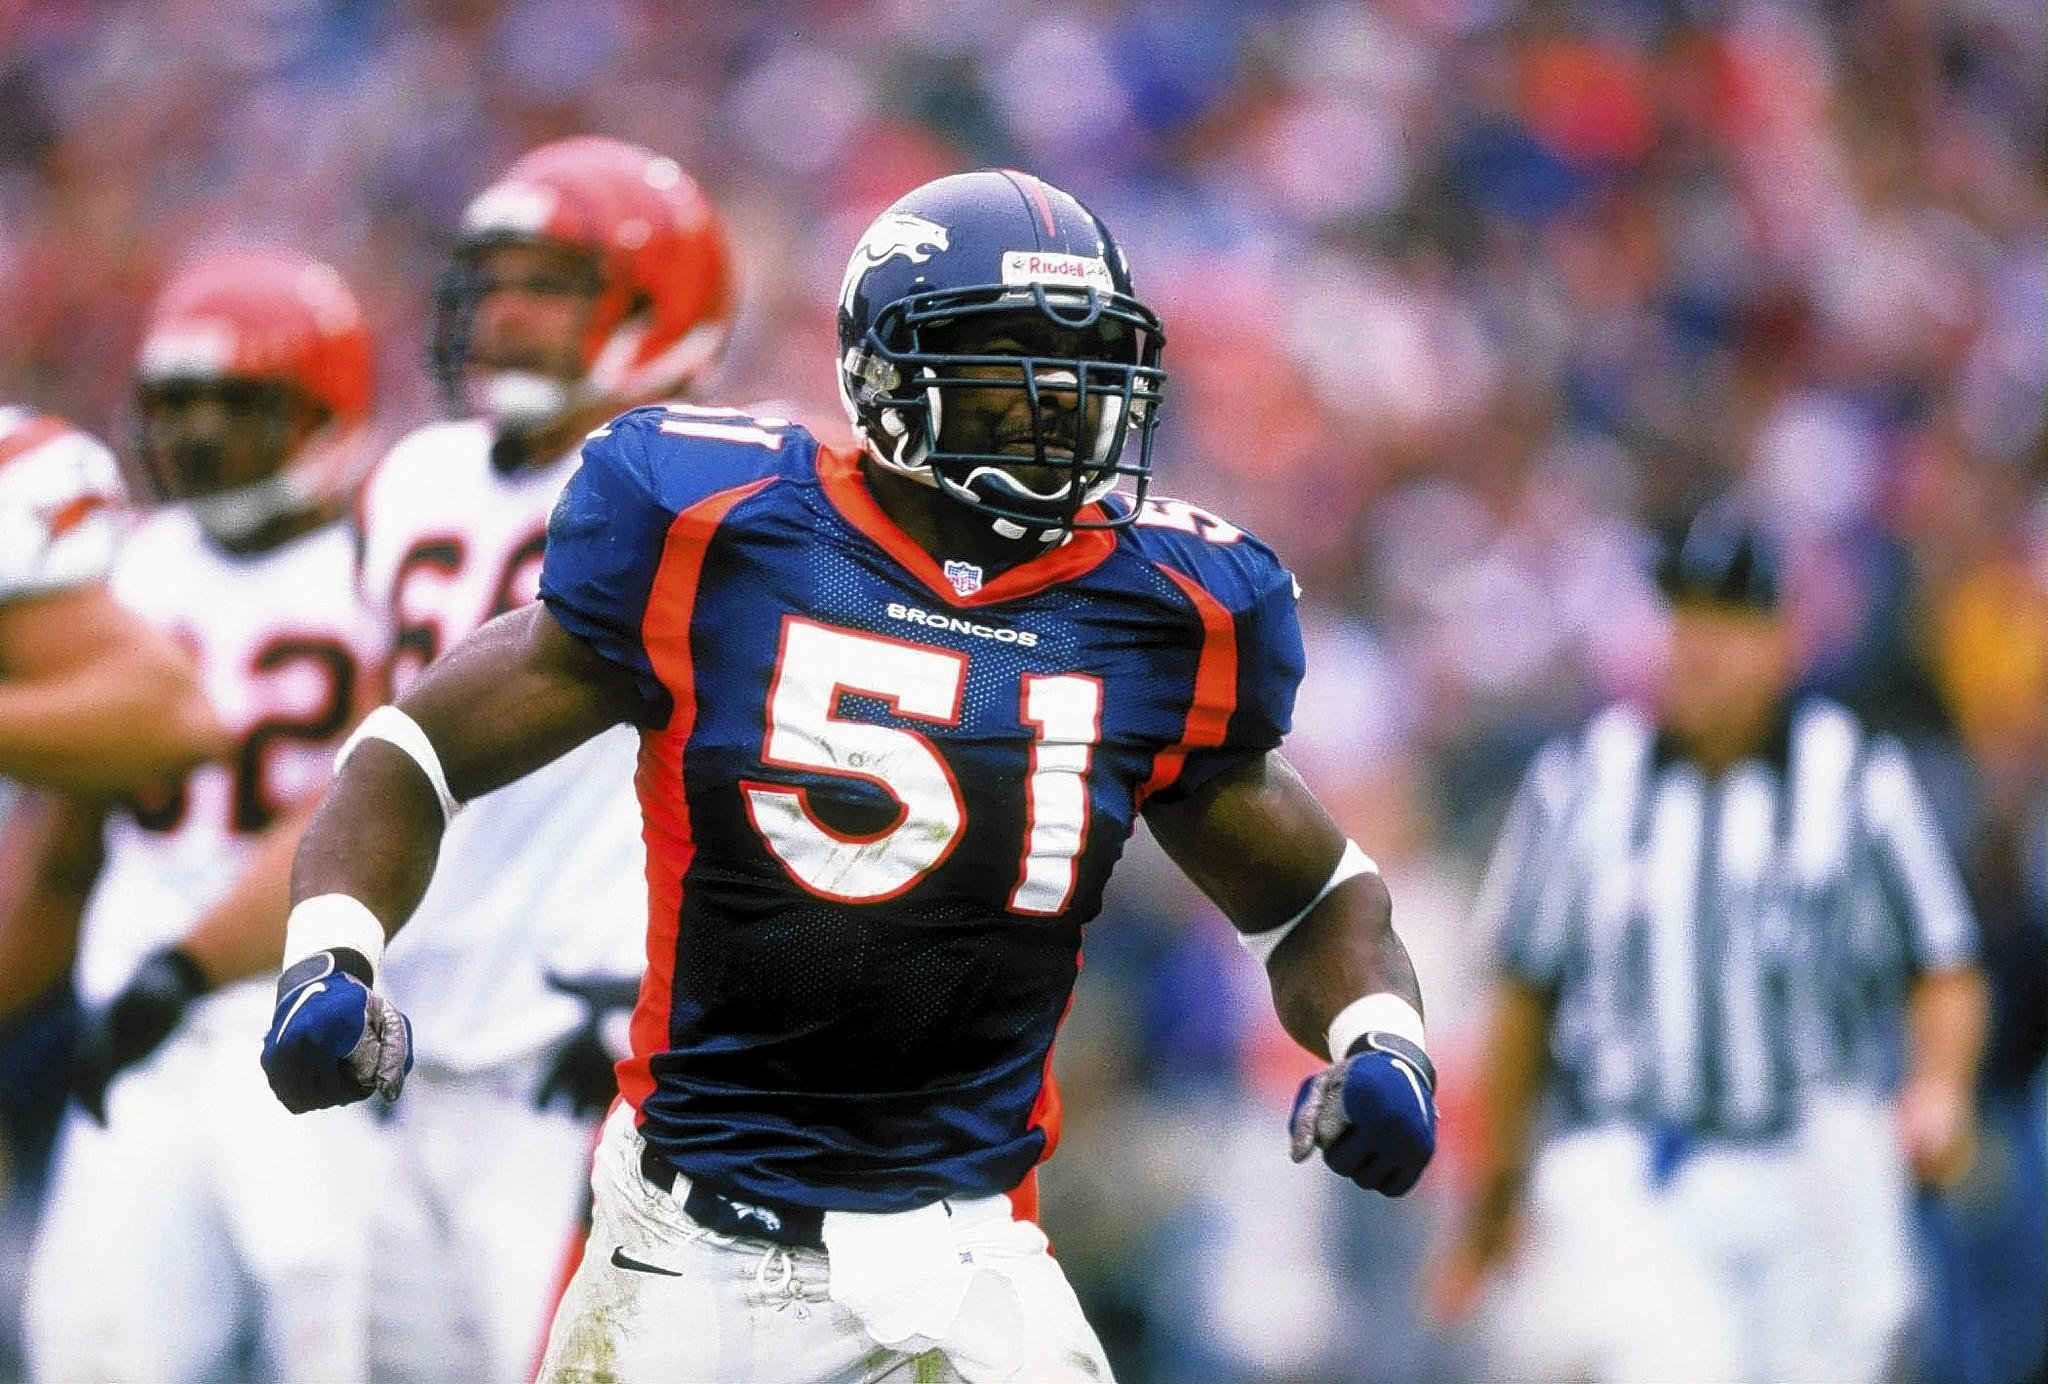 21 Sep 1997: Linebacker John Mobley #51 of the Denver Broncos celebrates during the Broncos 38-20 win over the Cincinnati Bengals at Mile High Stadium in Denver, Colorado.